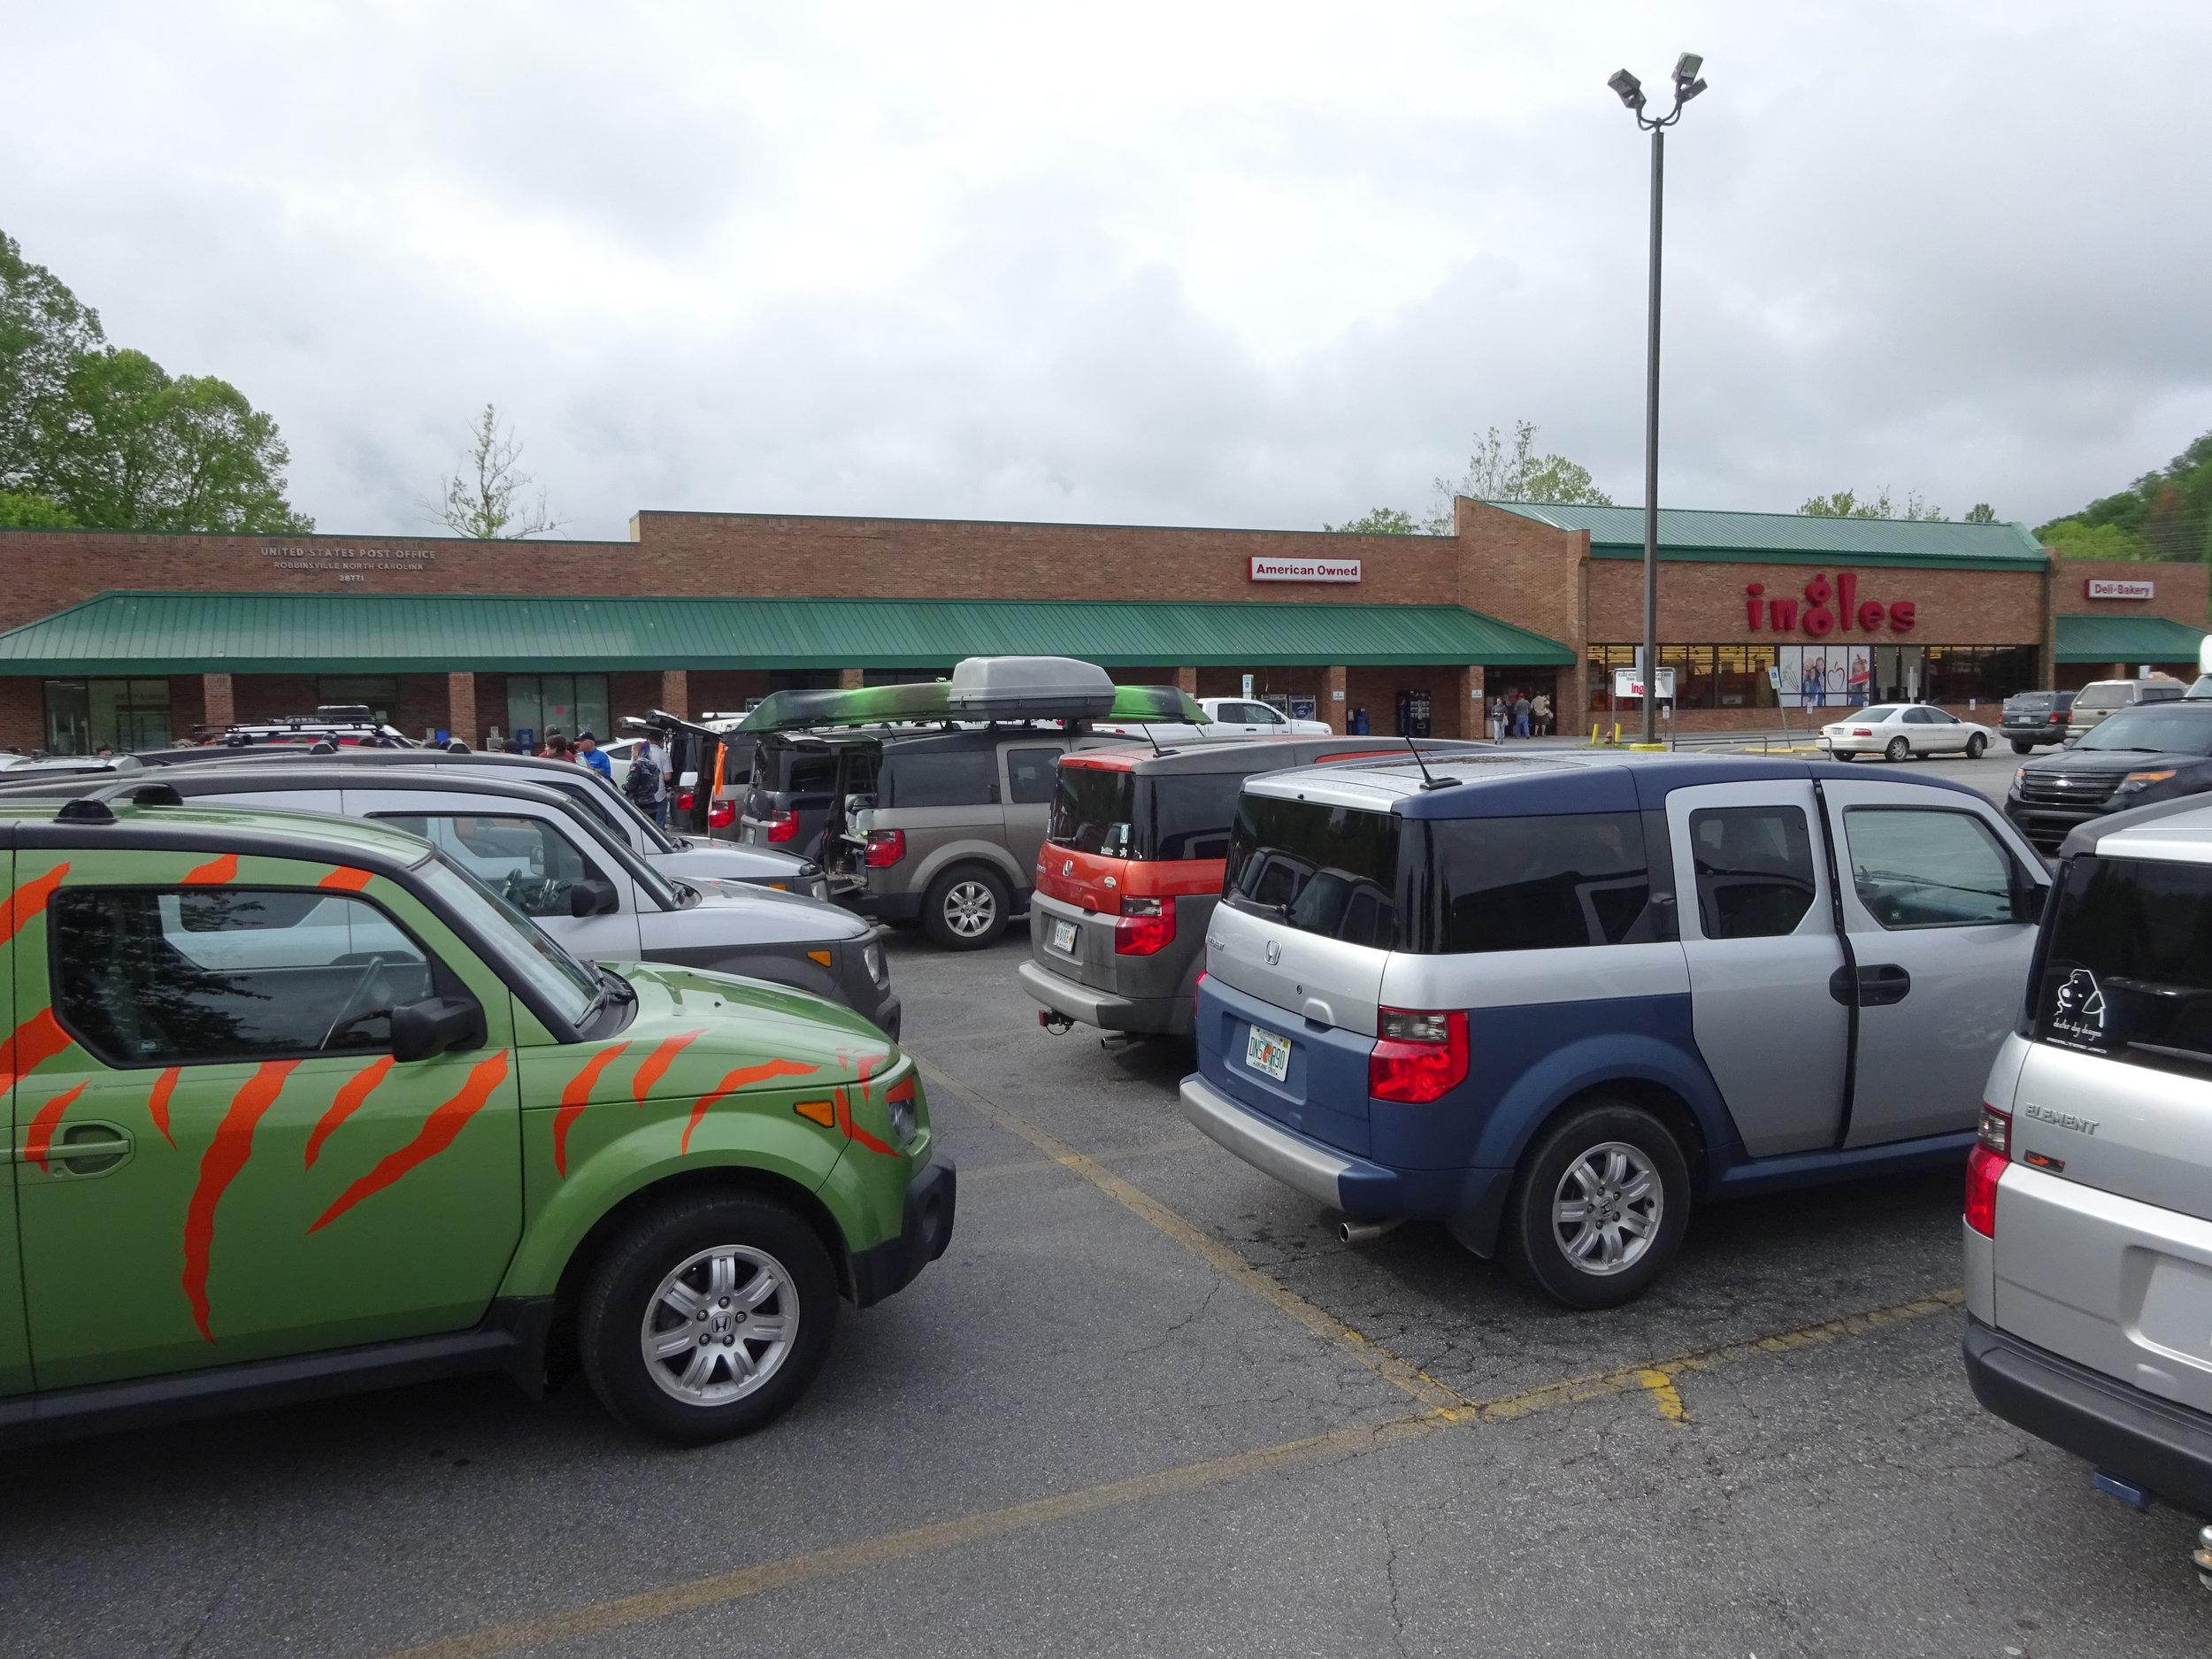 Meet Here Before 9AM - parking lot meetup location